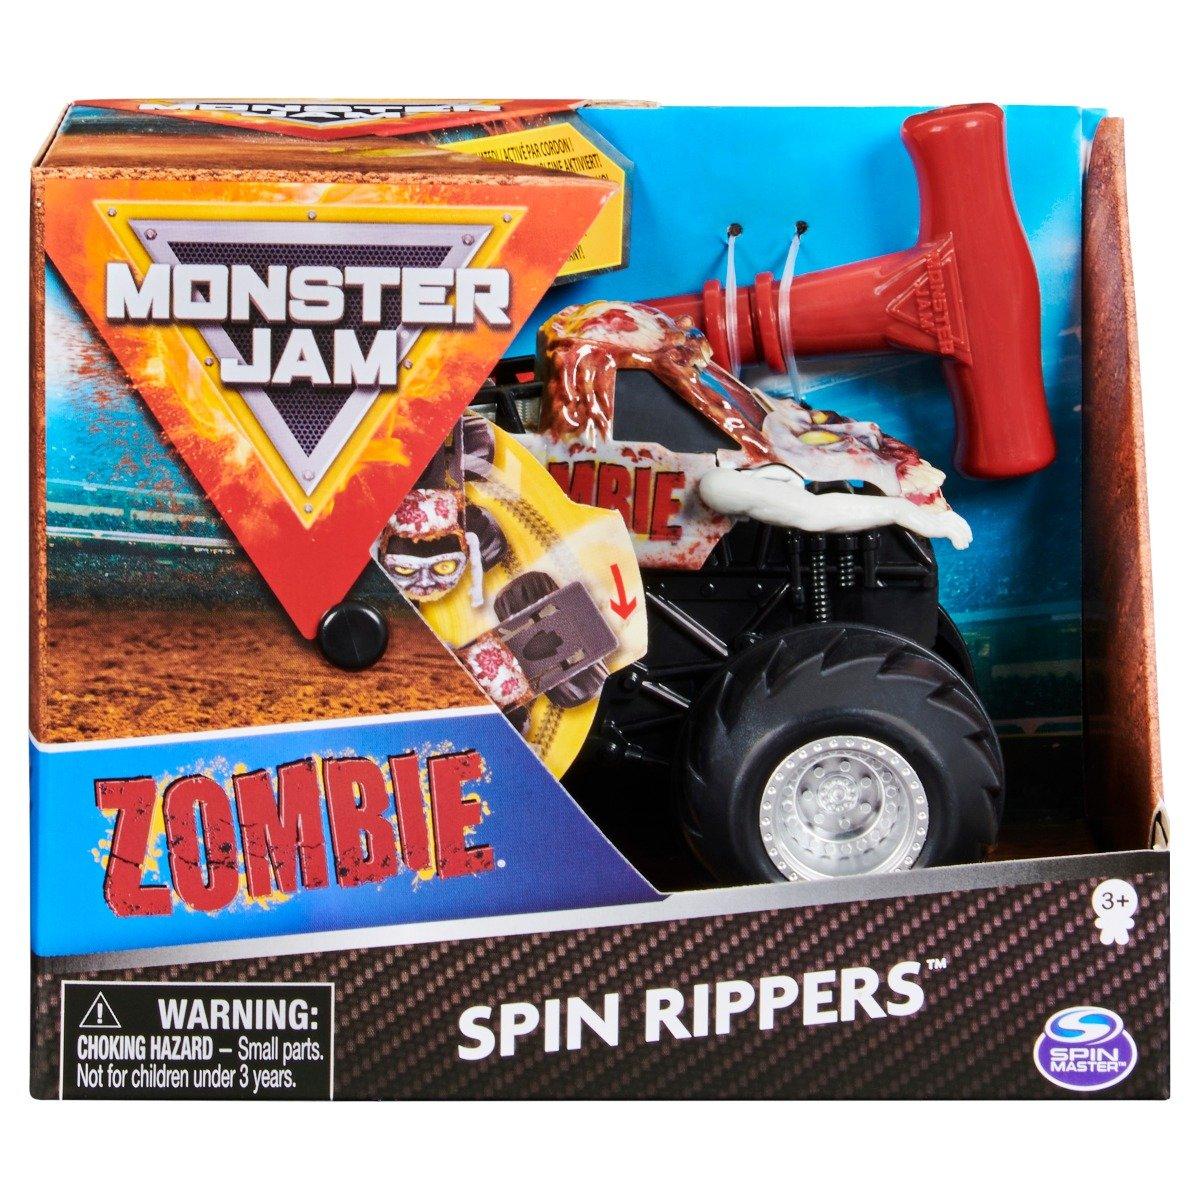 Masinuta Monster Jam, Scara 1:43, Zombie Spin Rippers imagine